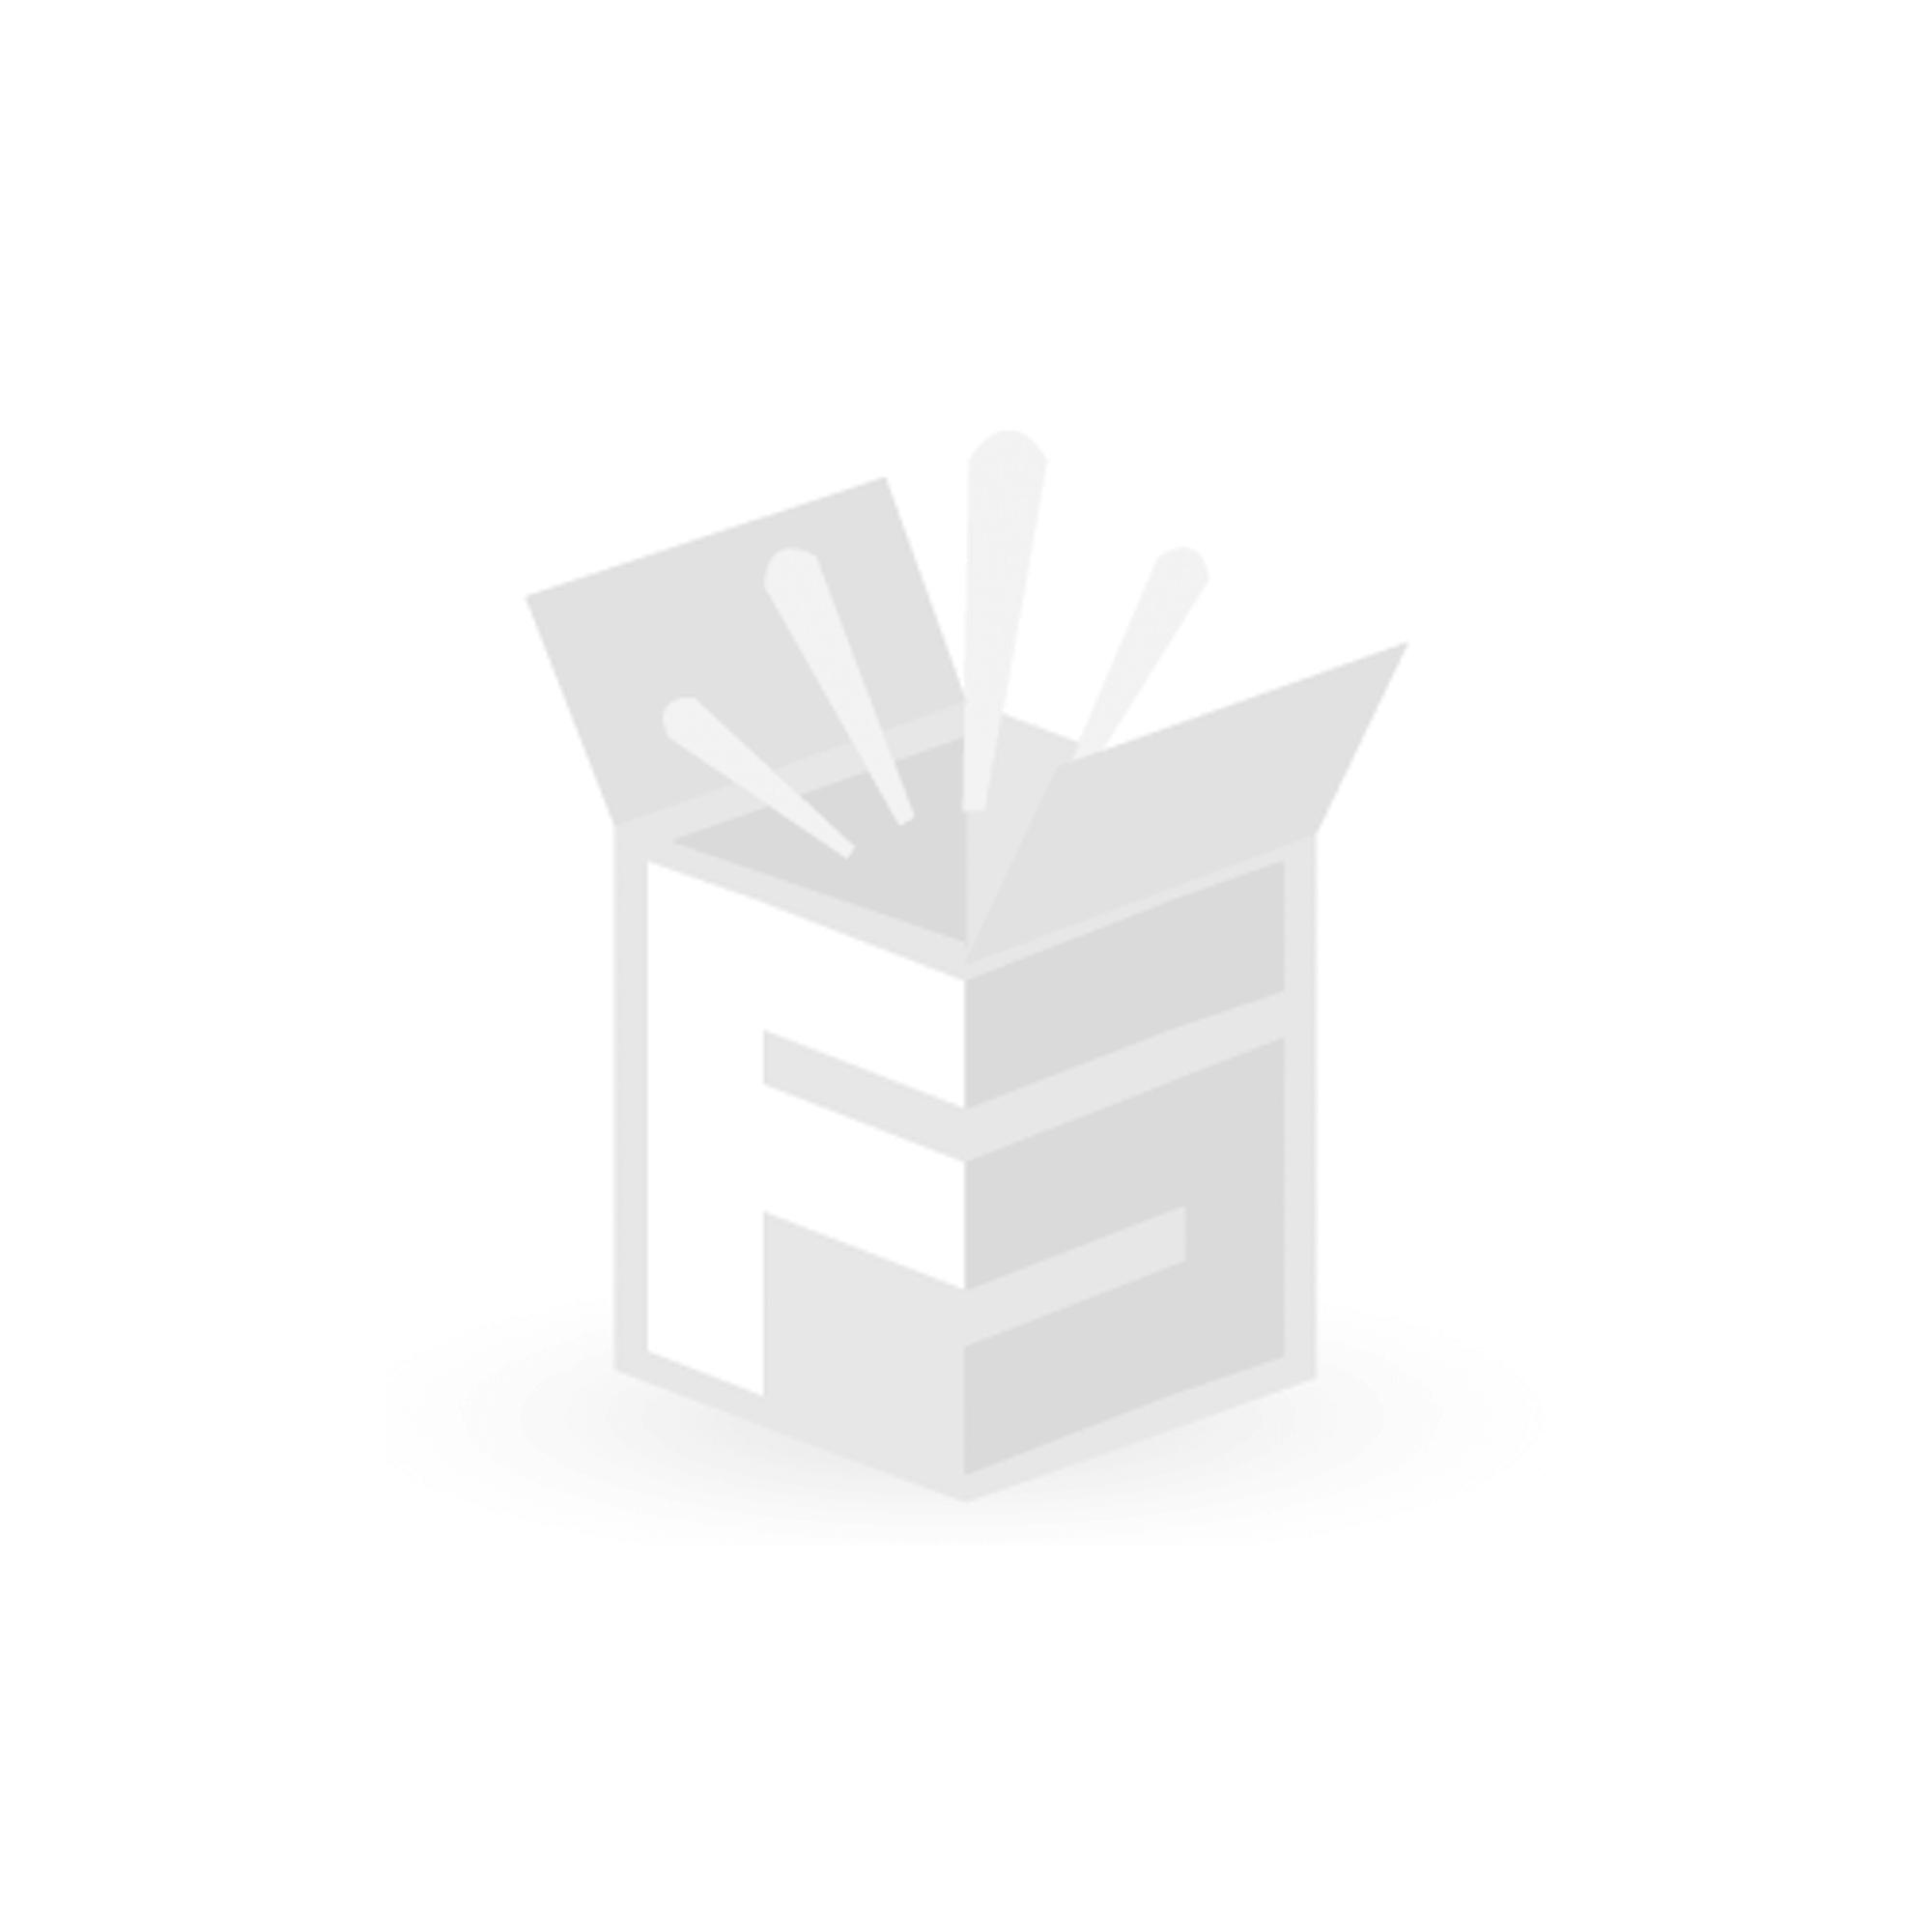 Kibernetik Serre-câbles 280 x 4.8 mm, noir, 100 pièces